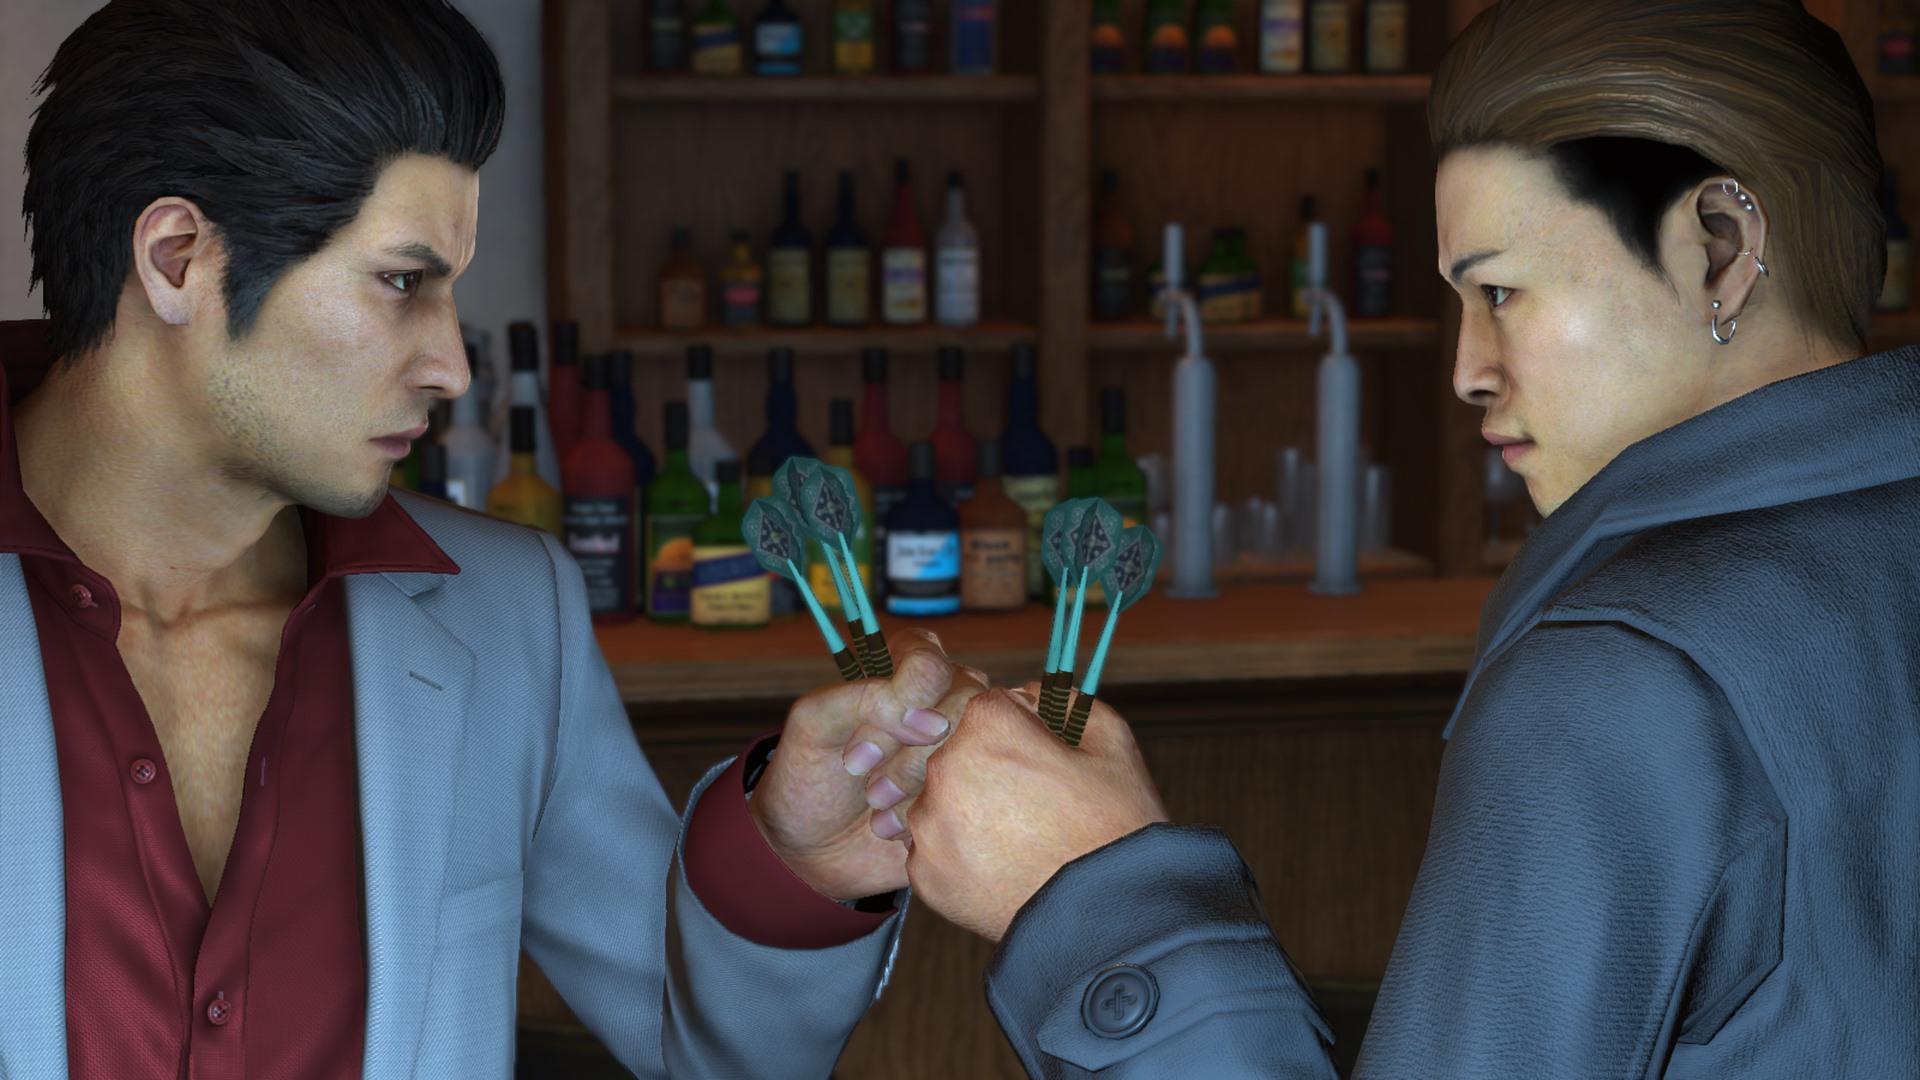 Yakuza 6 - darts is serious business